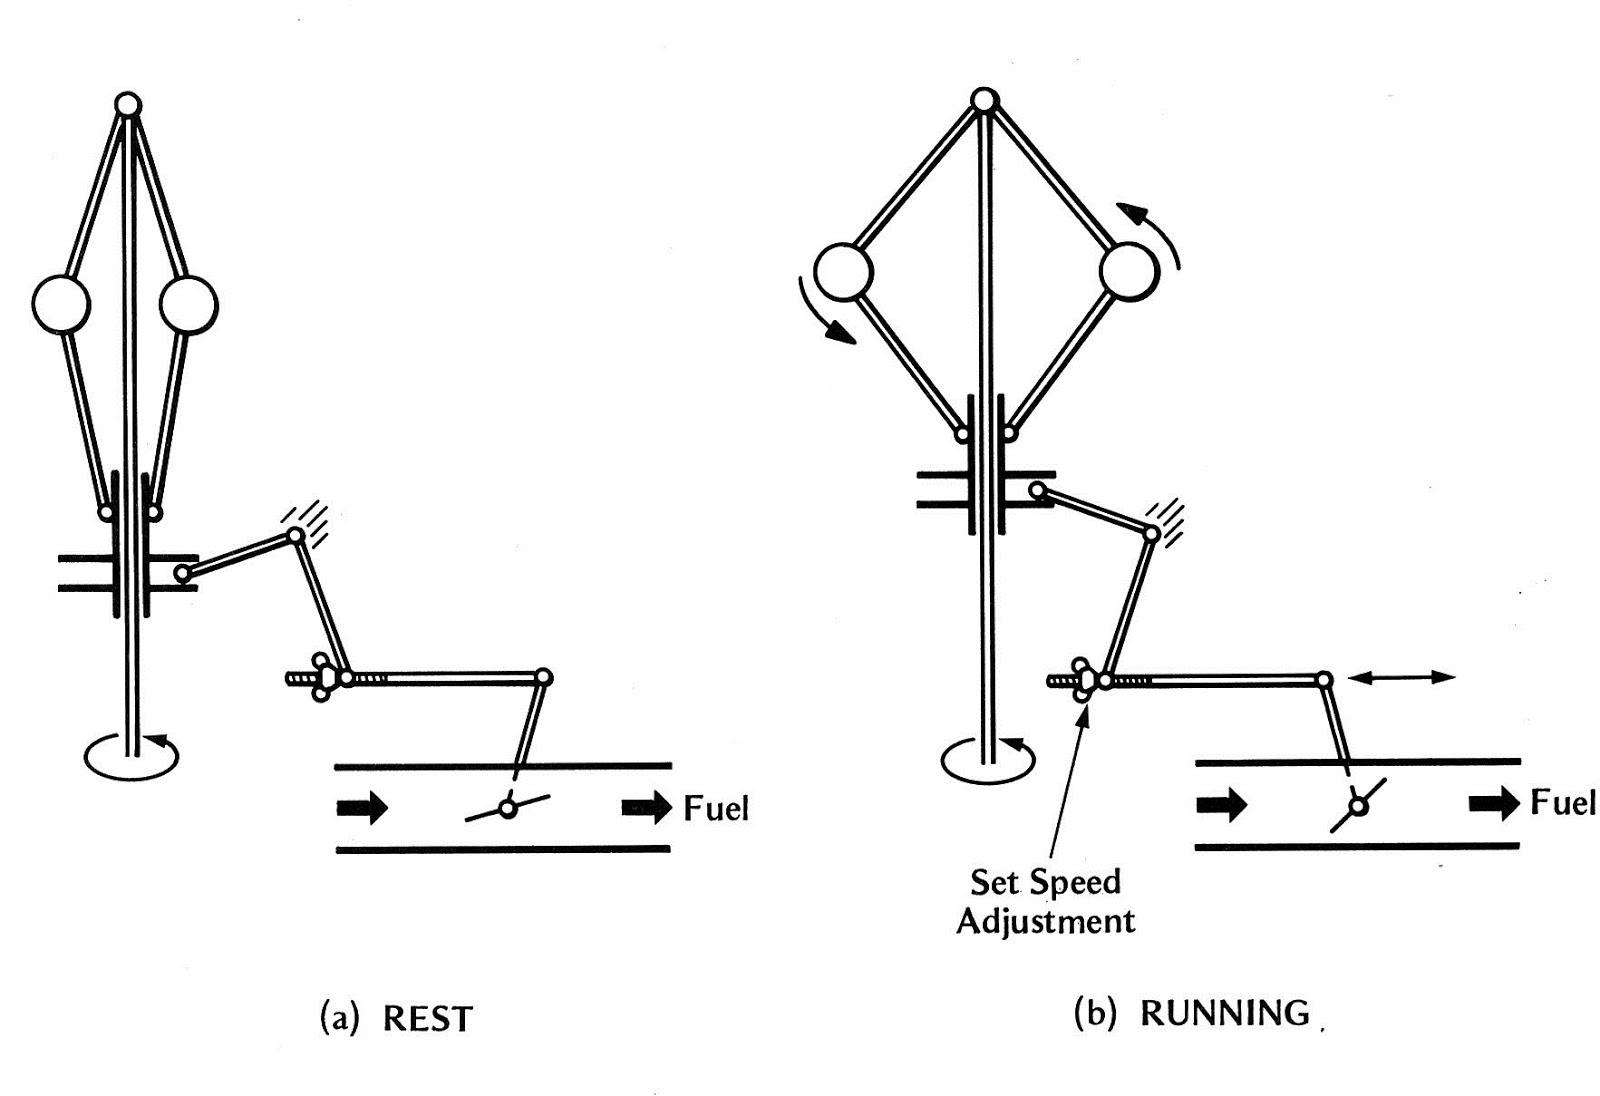 small resolution of for a 2000 pontiac grand prix se fuse box diagram 2006 chevy equinox serpentine belt